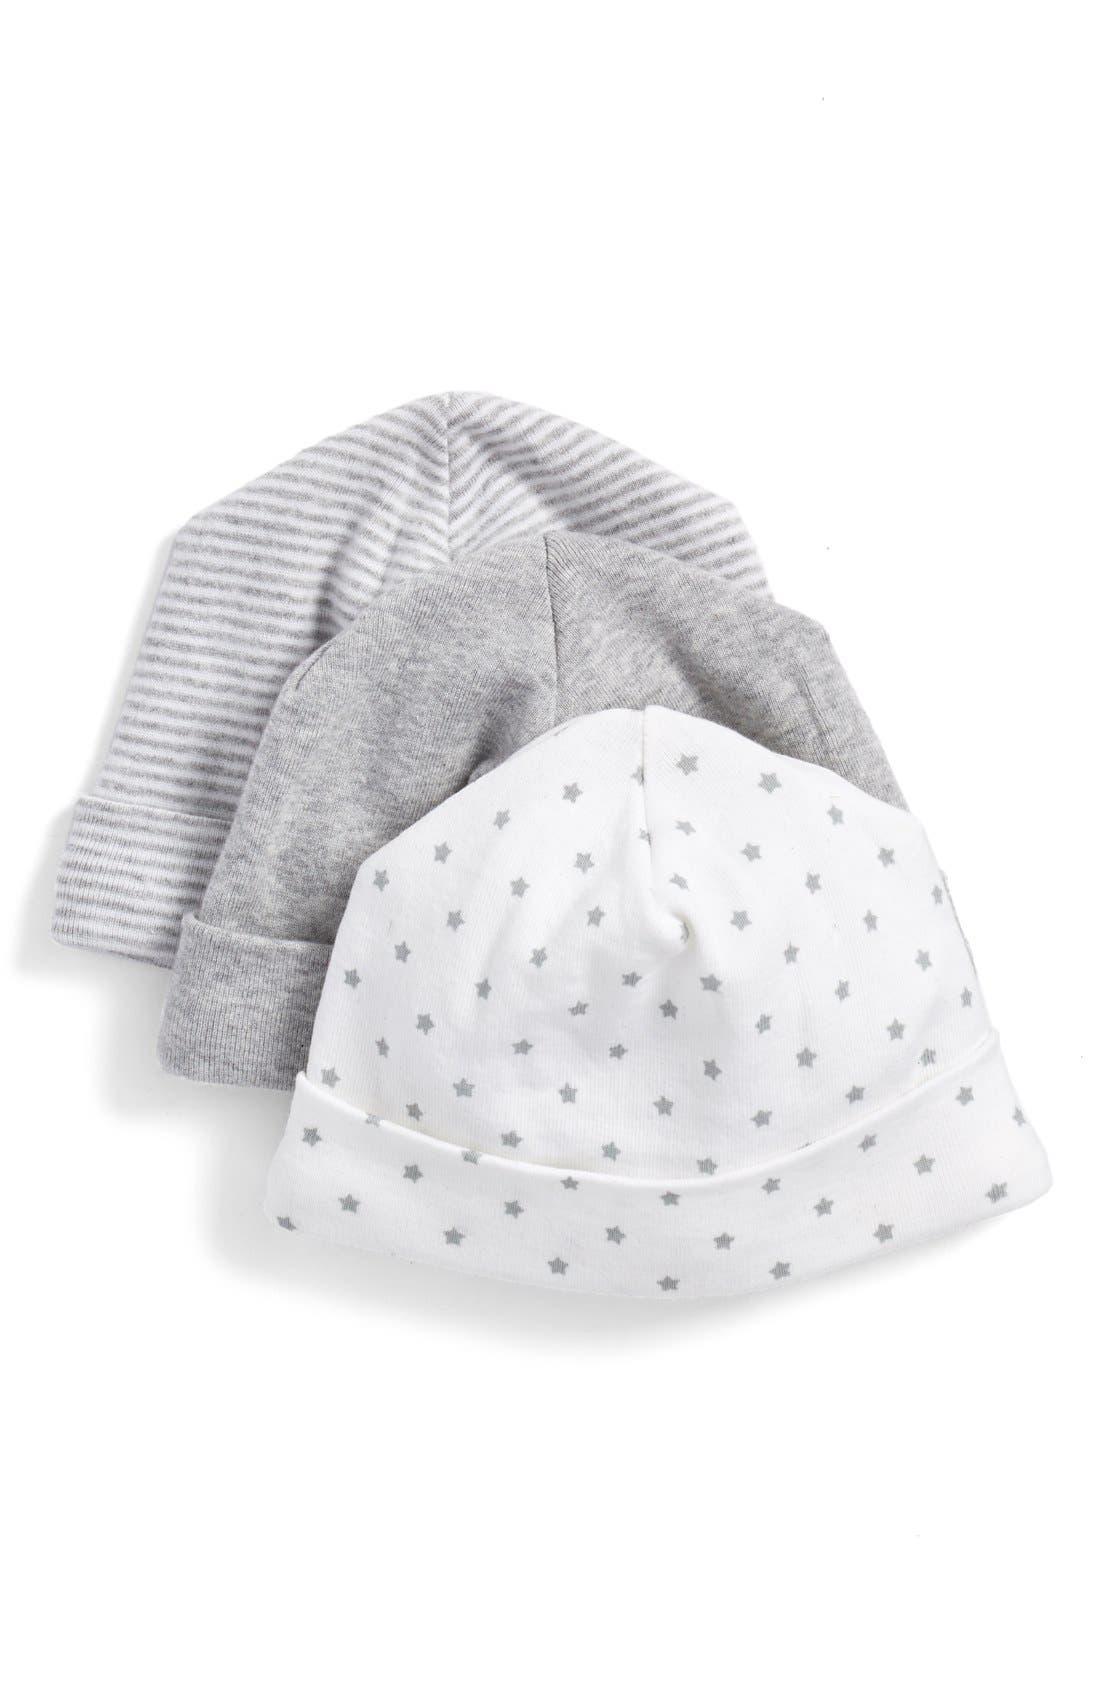 Cotton Hats,                             Main thumbnail 1, color,                             Grey Ash Heather Pack